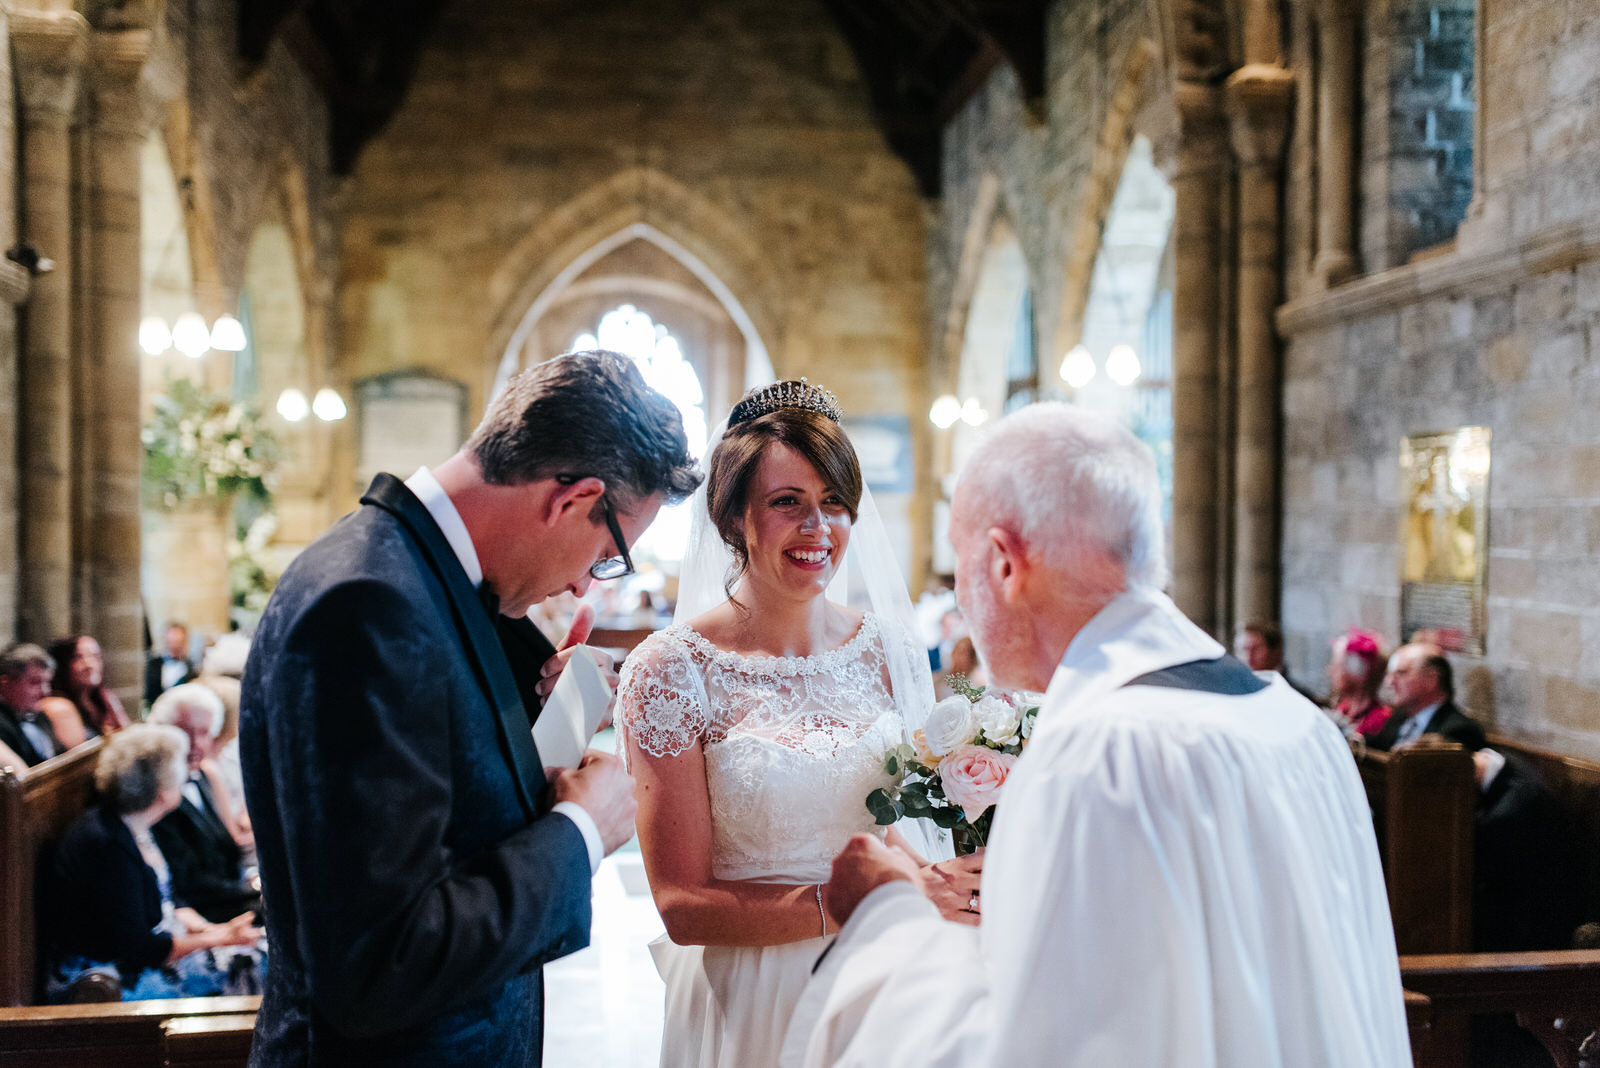 Vicar hands register to Groom towards end of Ceremony